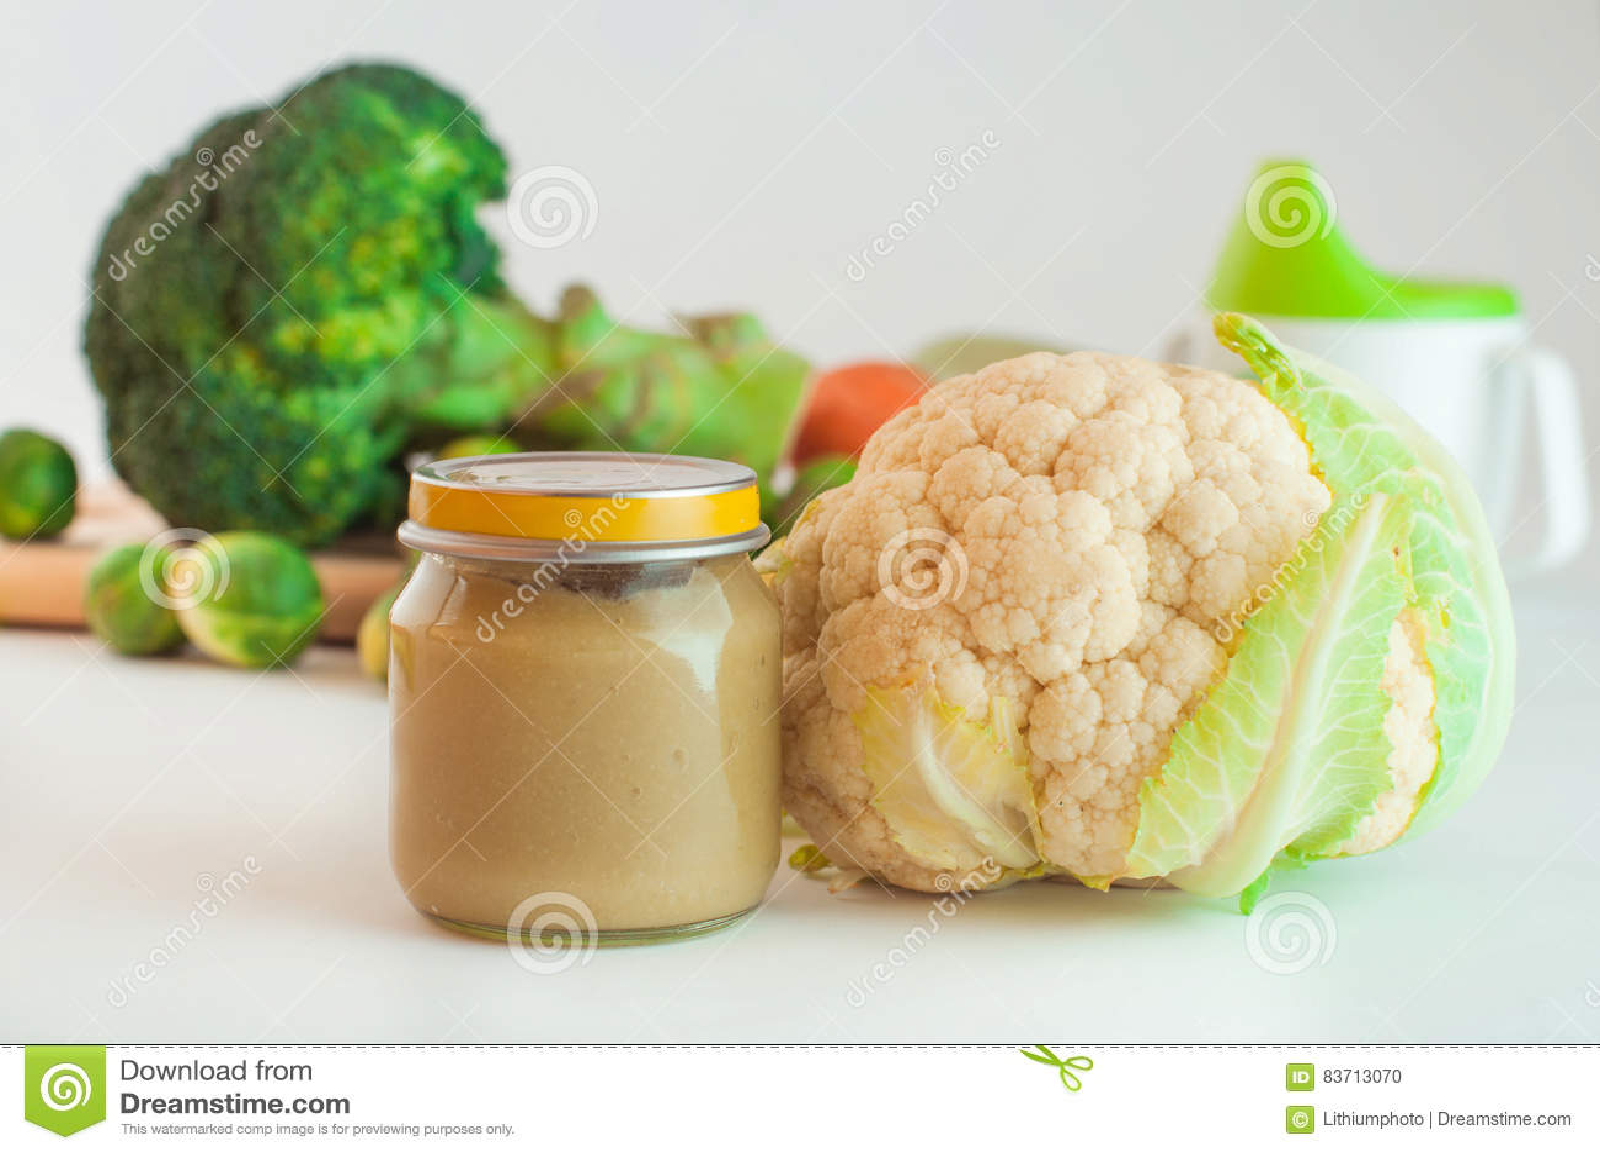 ellas kitchen baby food aid cookware 玻璃瓶子用自然婴儿食品蔬菜泥库存照片 图片包括有厨房 子项 瓶子 玻璃瓶子用自然婴儿食品蔬菜泥